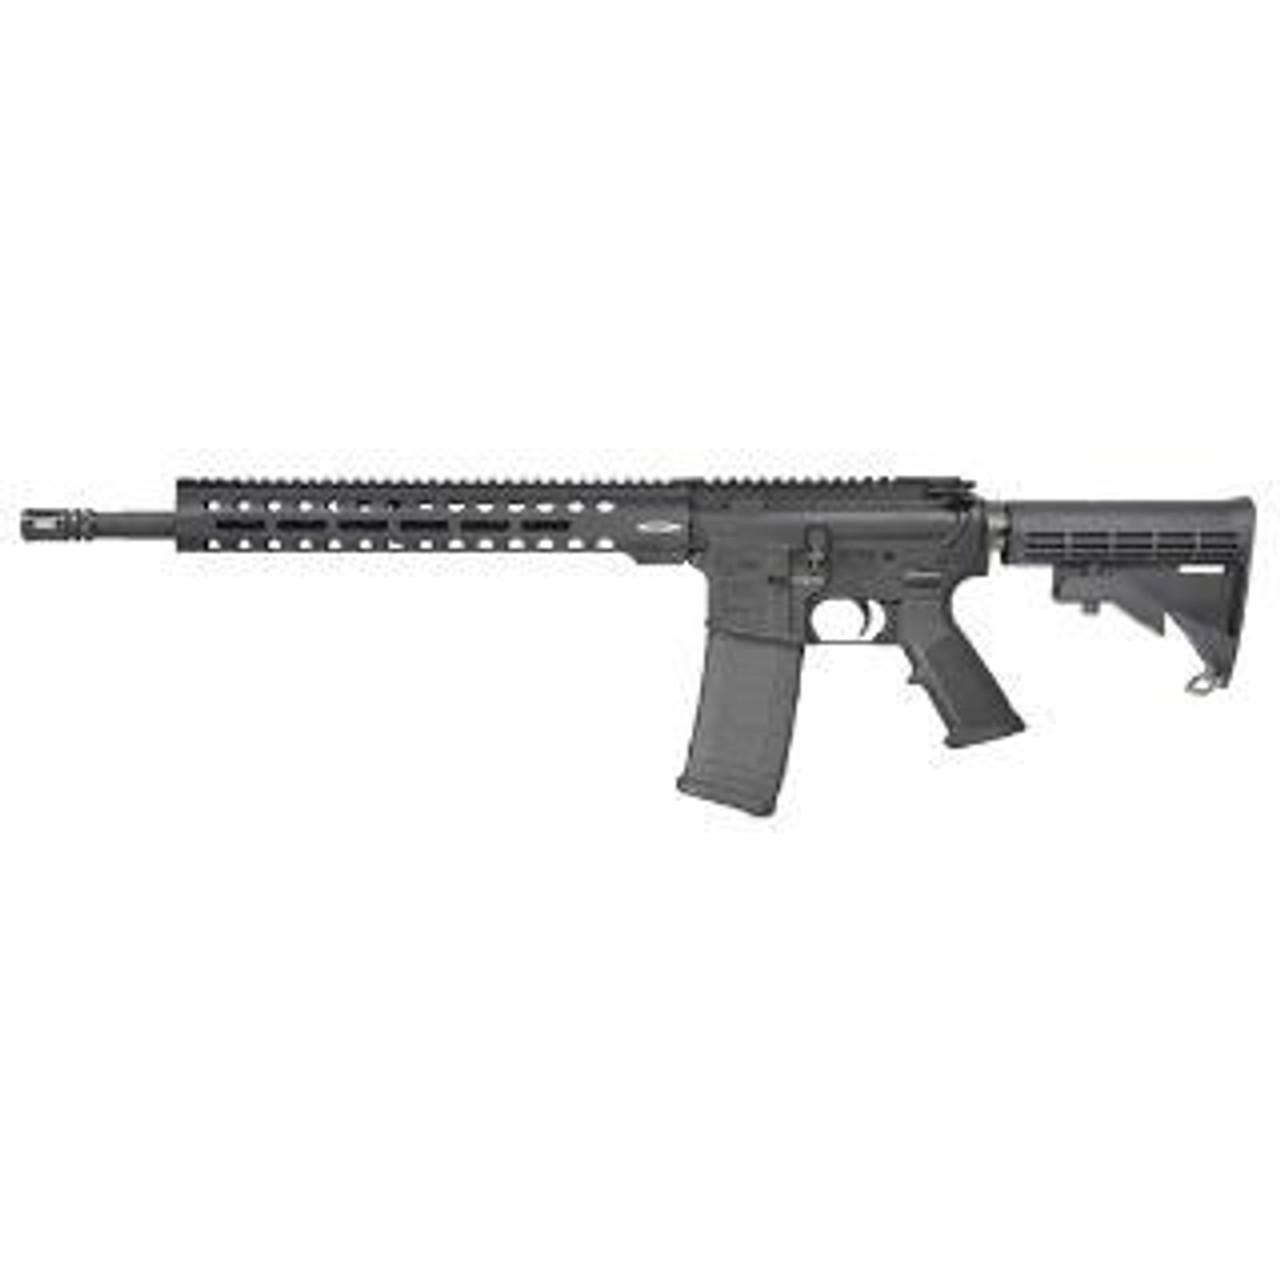 Colt Trooper Optic Ready Carbine LE6920-R - California Legal - .223/5.56